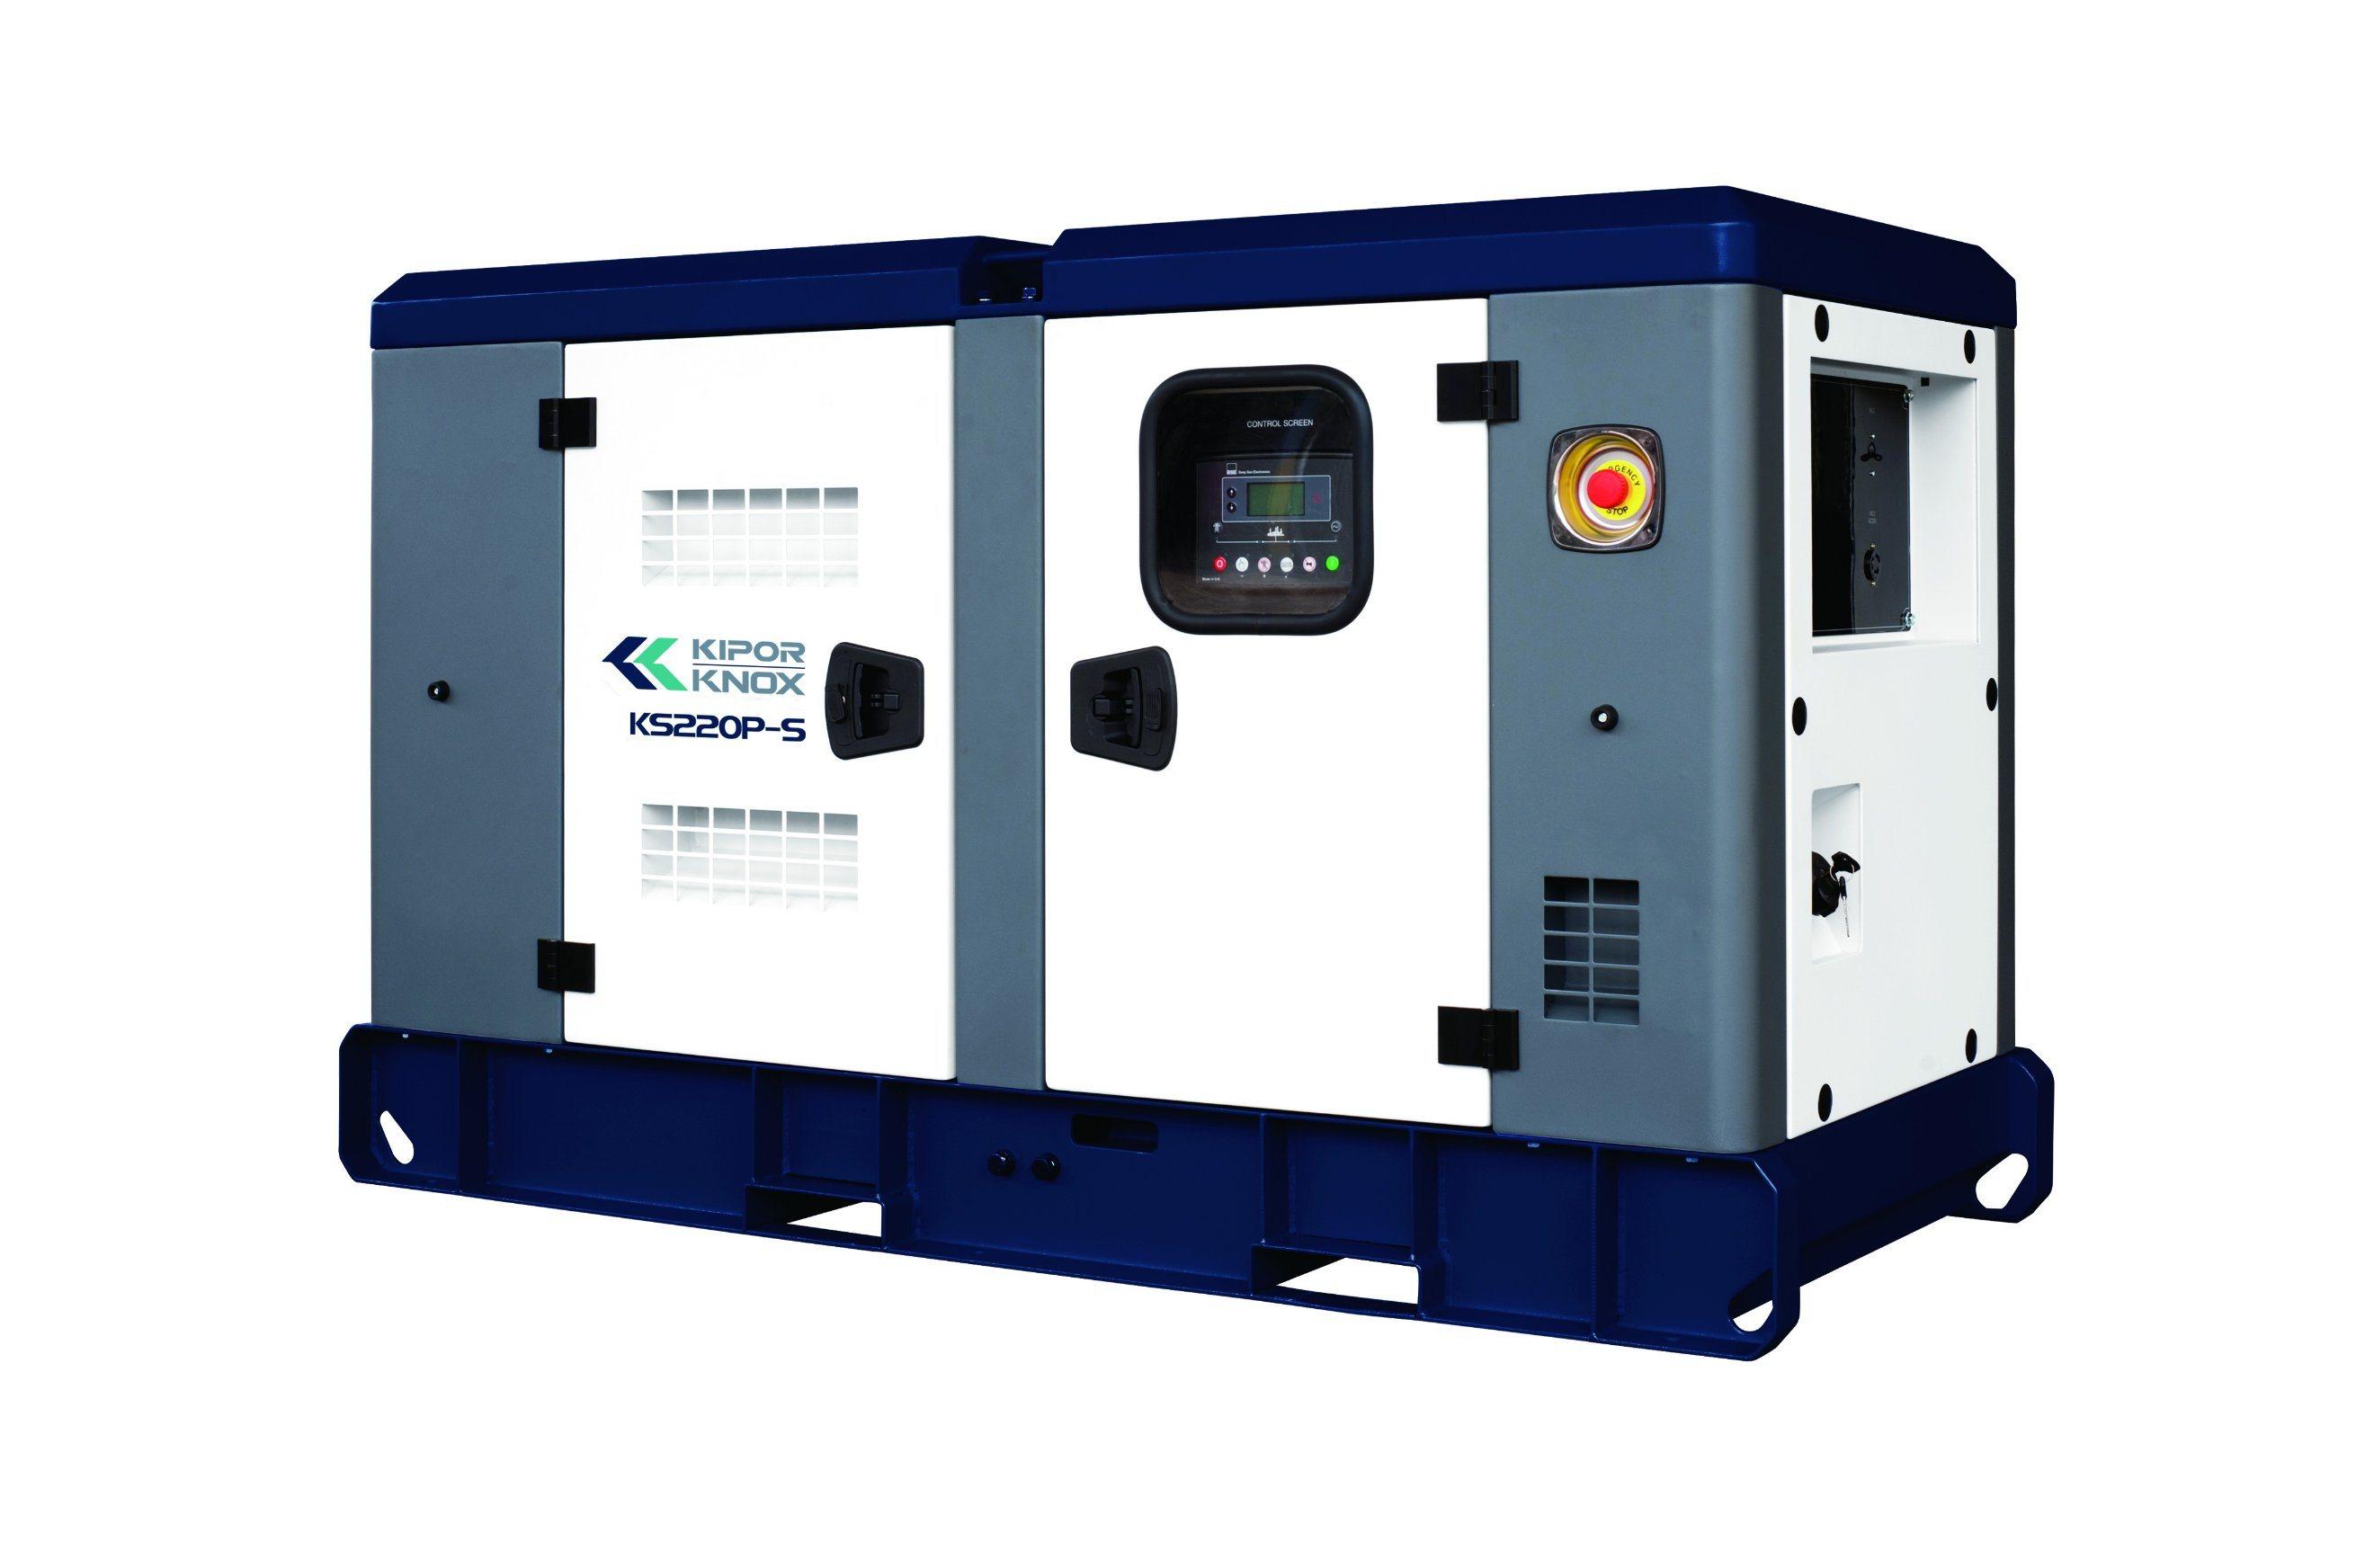 Kipor/Knox Perkins Engine Stamford Alternator Dse Control Diesel Generator Ks220p-S